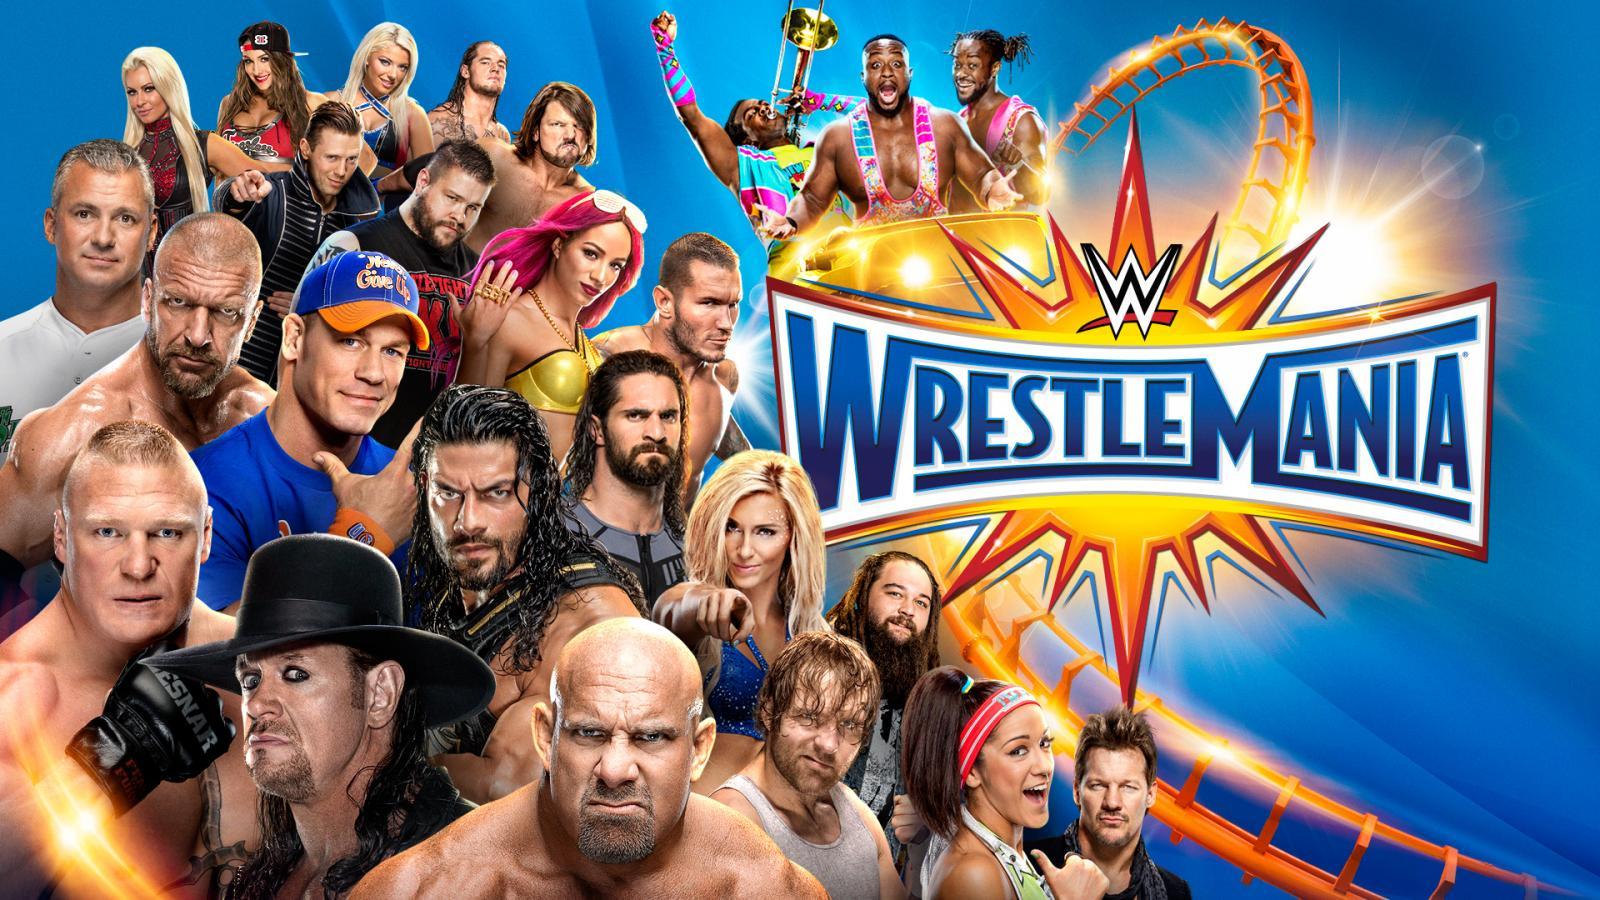 http://dailyddt.com/files/2017/03/WrestleMania-33-Logo-Poster.jpg